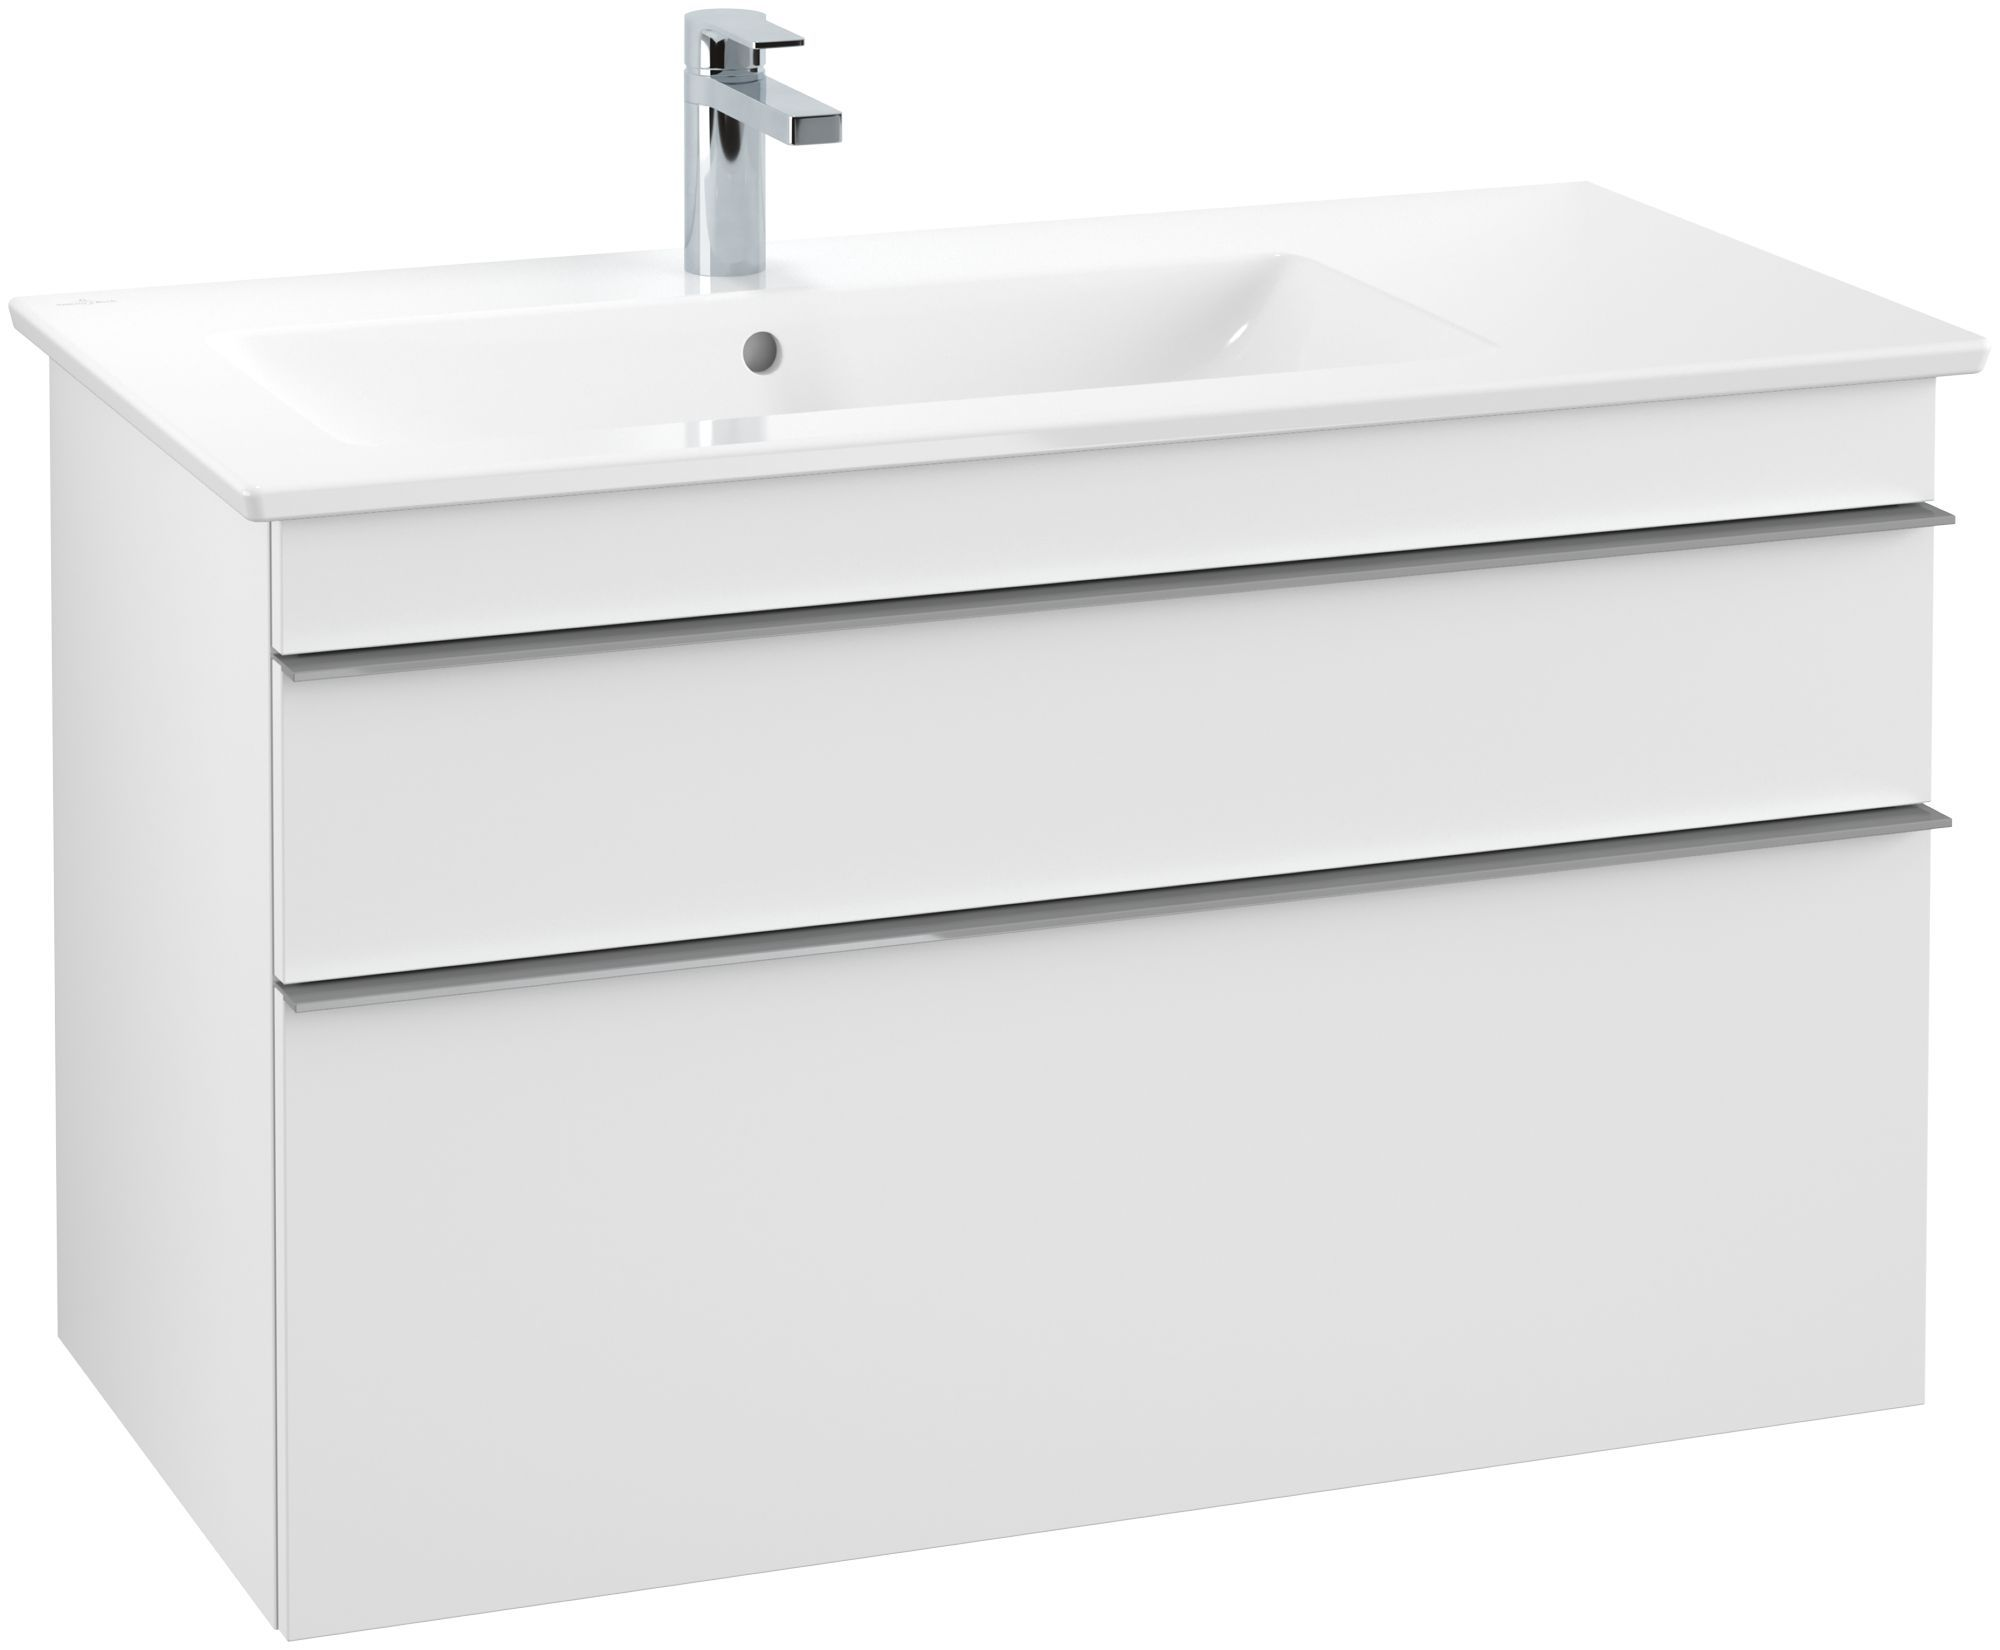 Villeroy & Boch Venticello Waschtischunterschrank 2 Auszüge B:953xT:502xH:590mm weiß matt Griffe grau A92703MS